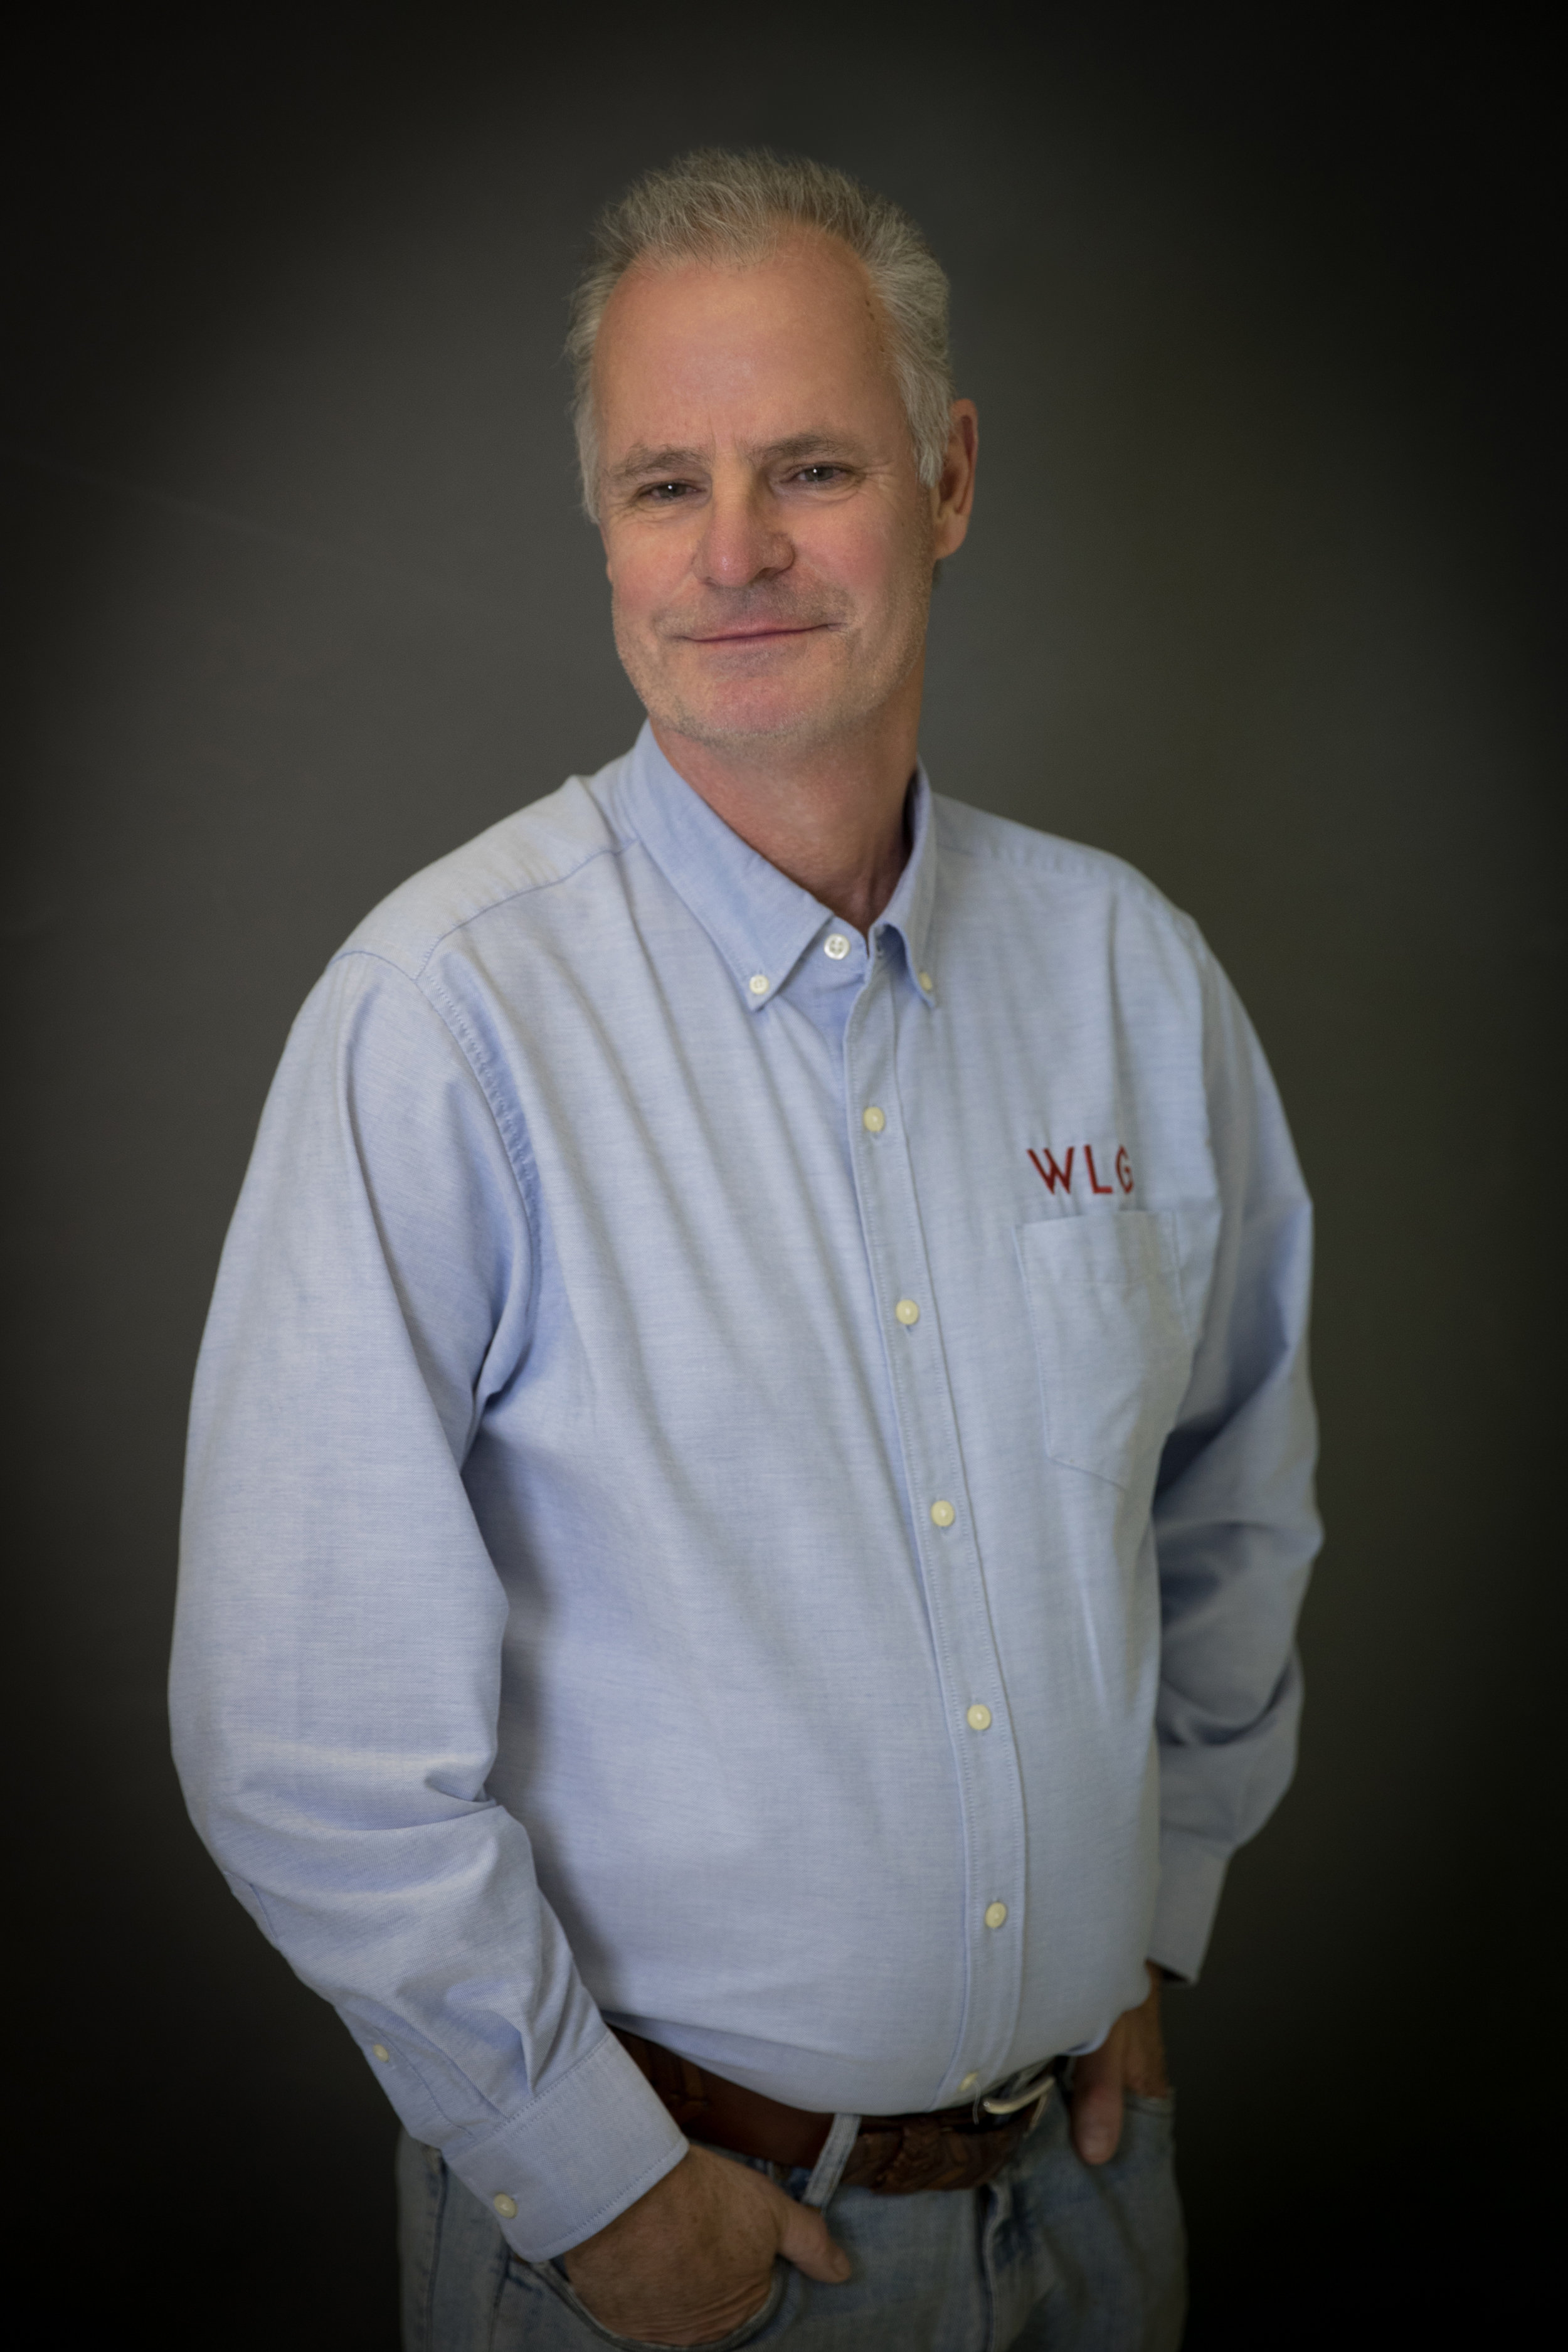 Neil Whitehouse, Business Development